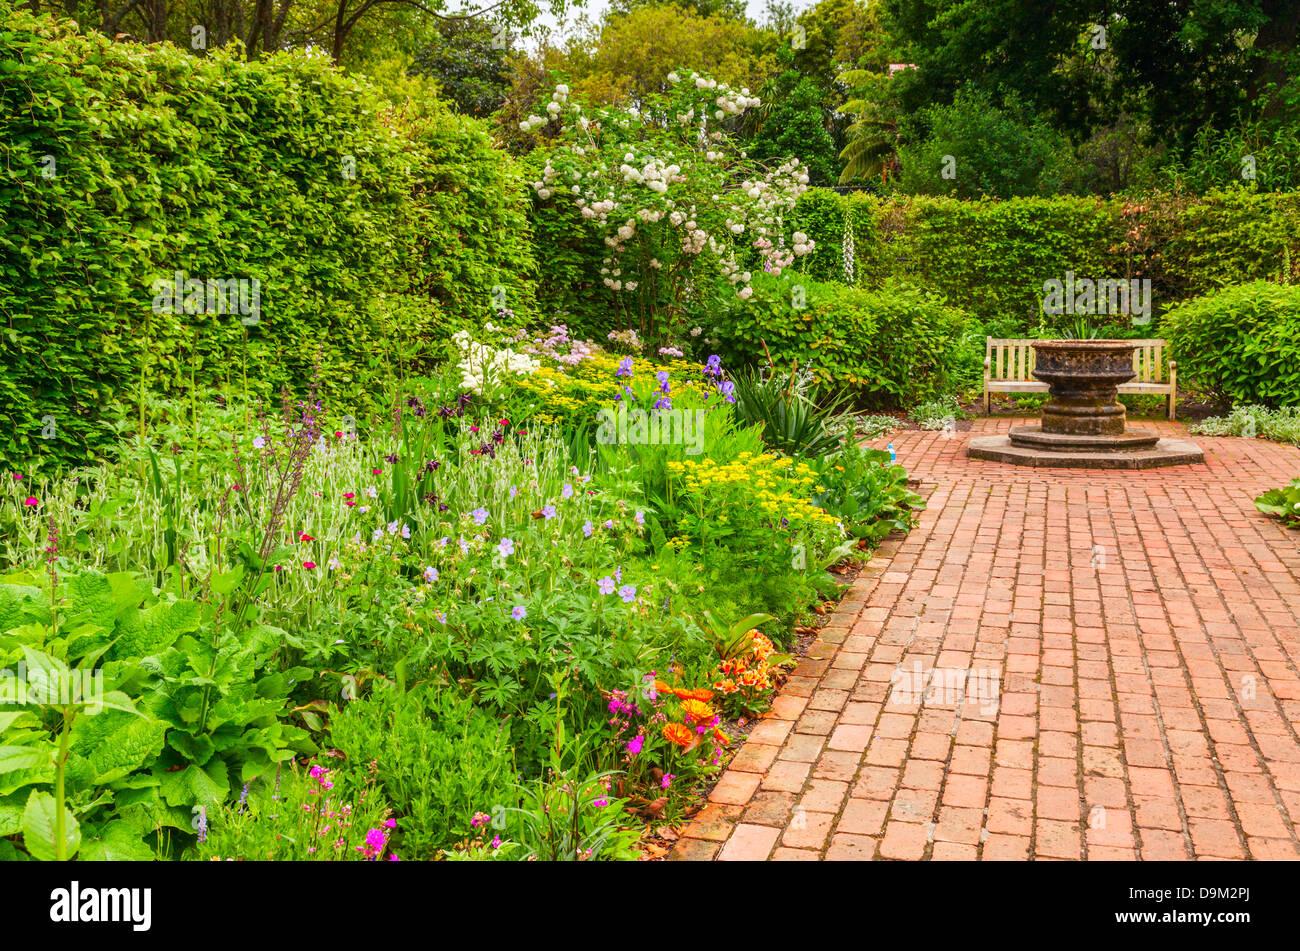 Krautige Grenze, English Flower Garden, Hamilton Gardens, Hamilton, Waikato, Neuseeland. Stockbild